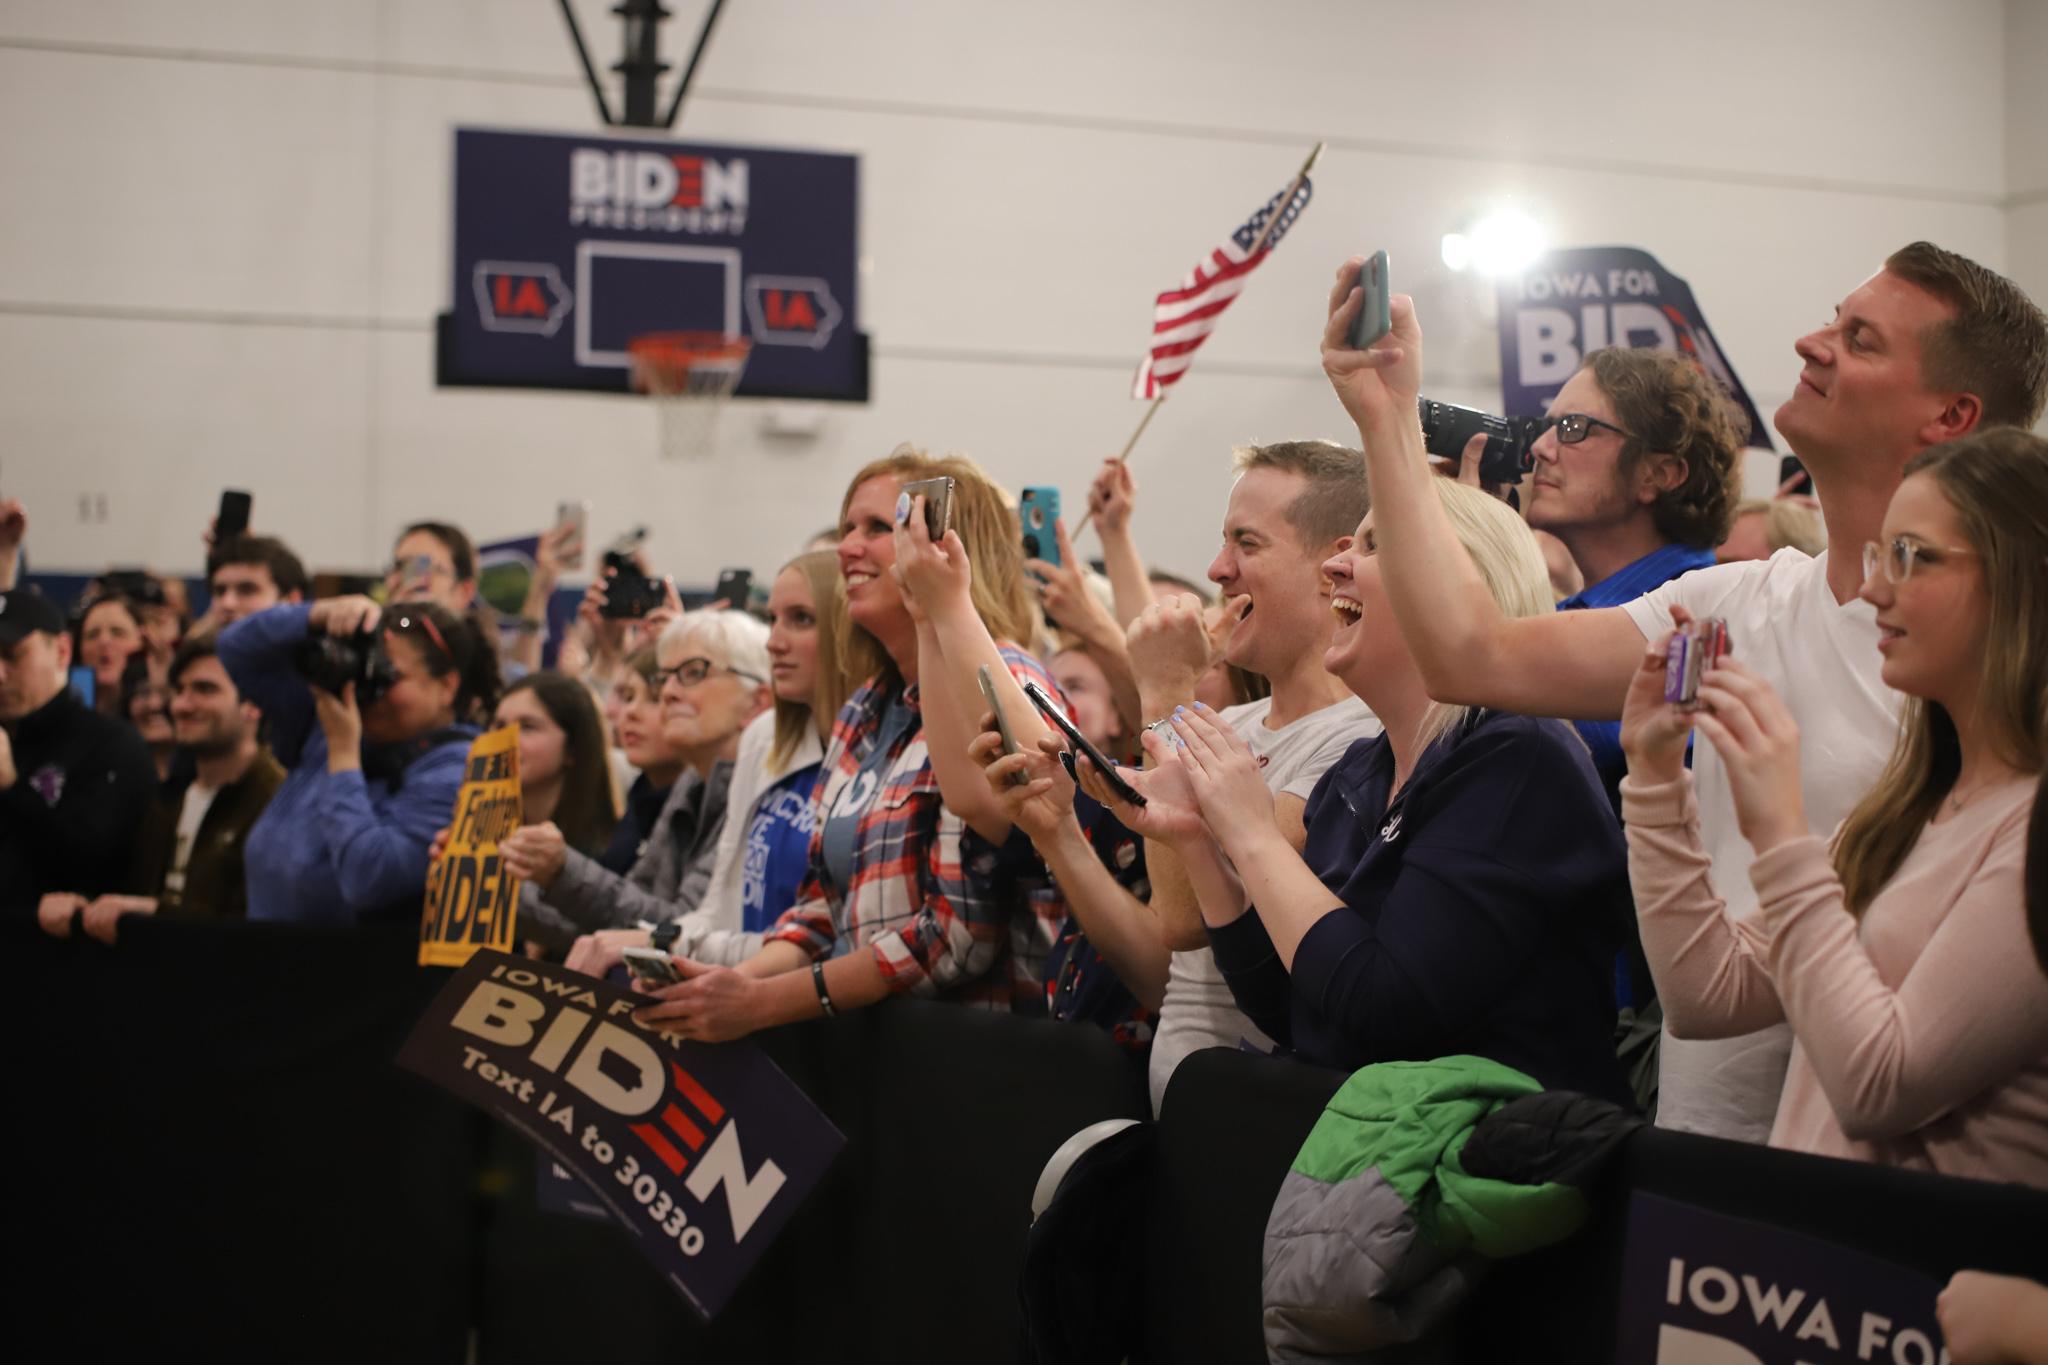 Voters at Biden rally. (Brita Hunegs, 14 East)